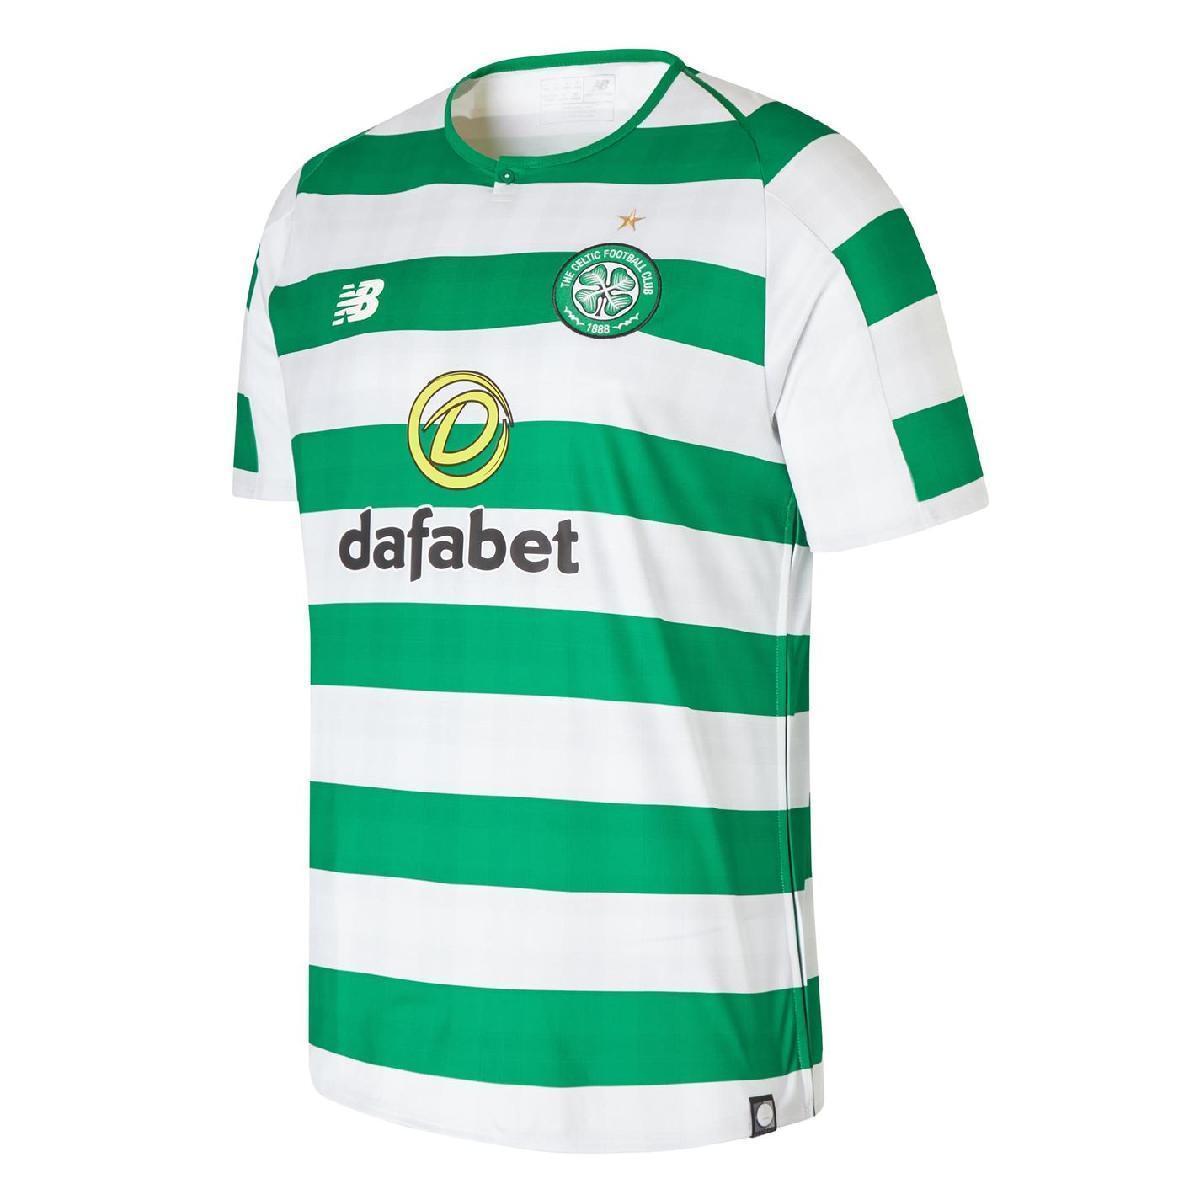 New Balance Celtic Fußball Trikot T-shirt Herren Home Shirt 2018 2019 70